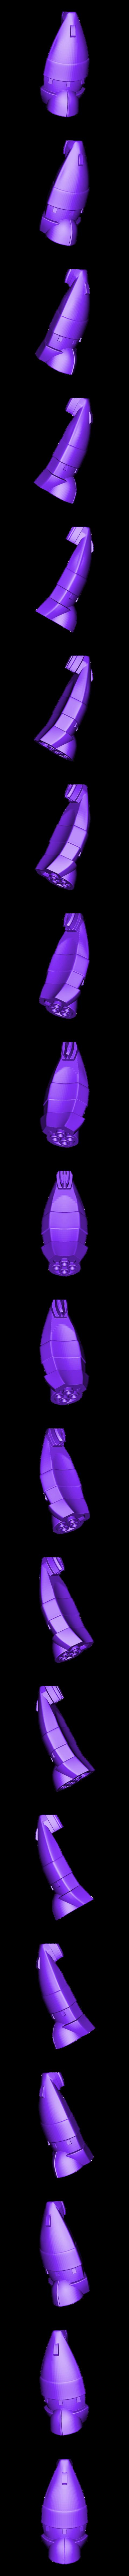 StarWalker_wing.obj Download free OBJ file The StarWalker • 3D print design, AlbertThePrintingMachine